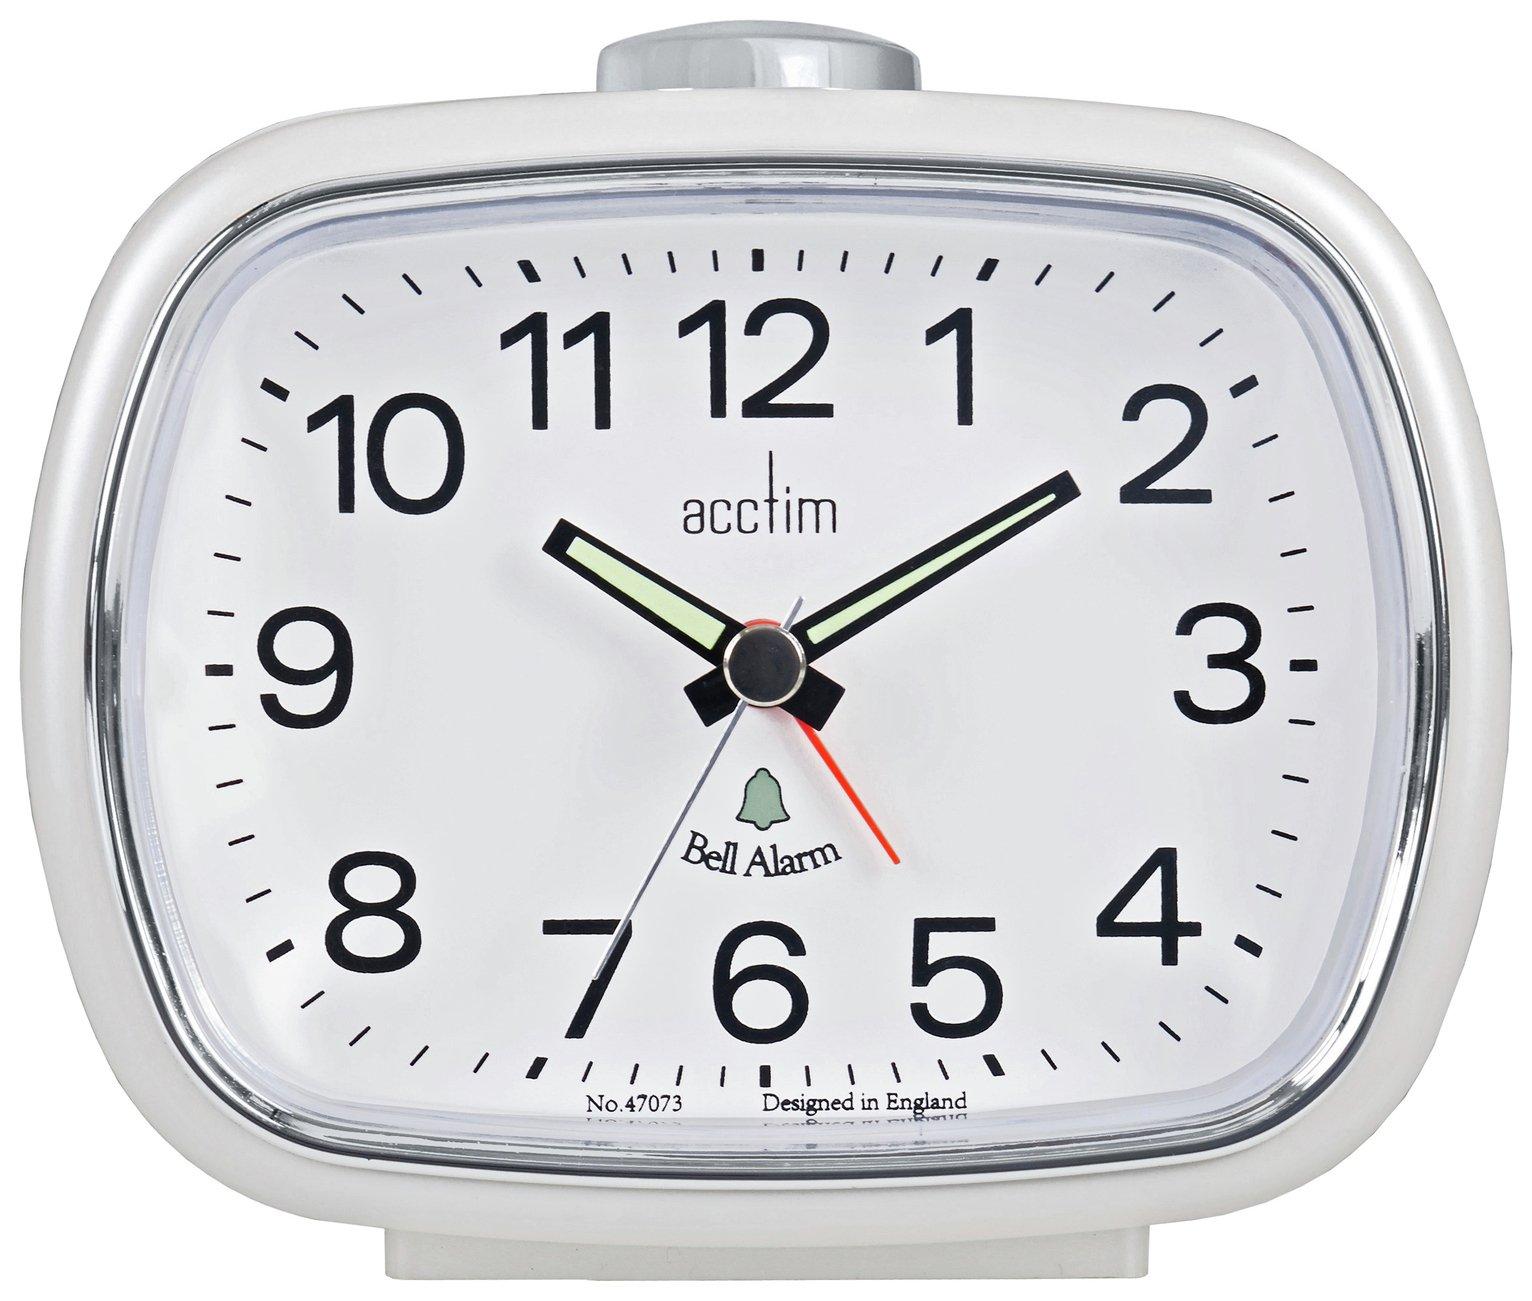 acctim clocks clock sale uk. Black Bedroom Furniture Sets. Home Design Ideas